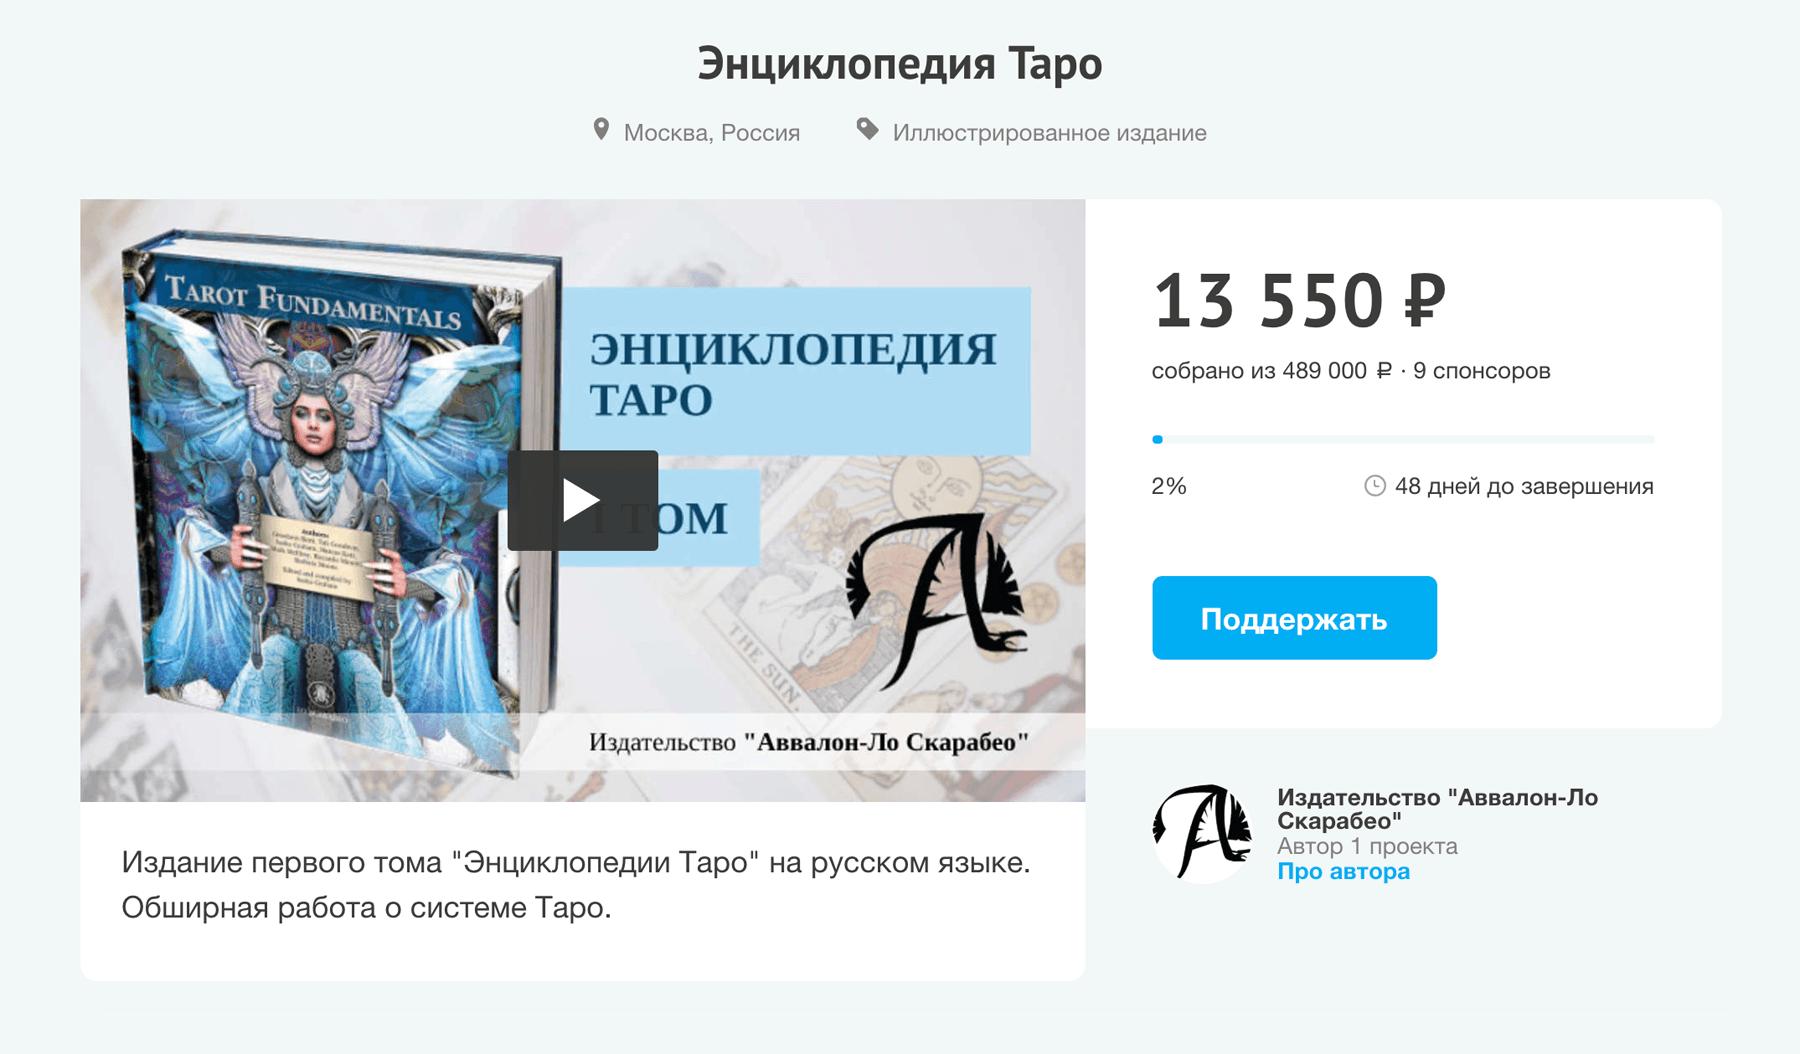 Энциклопедия Таро